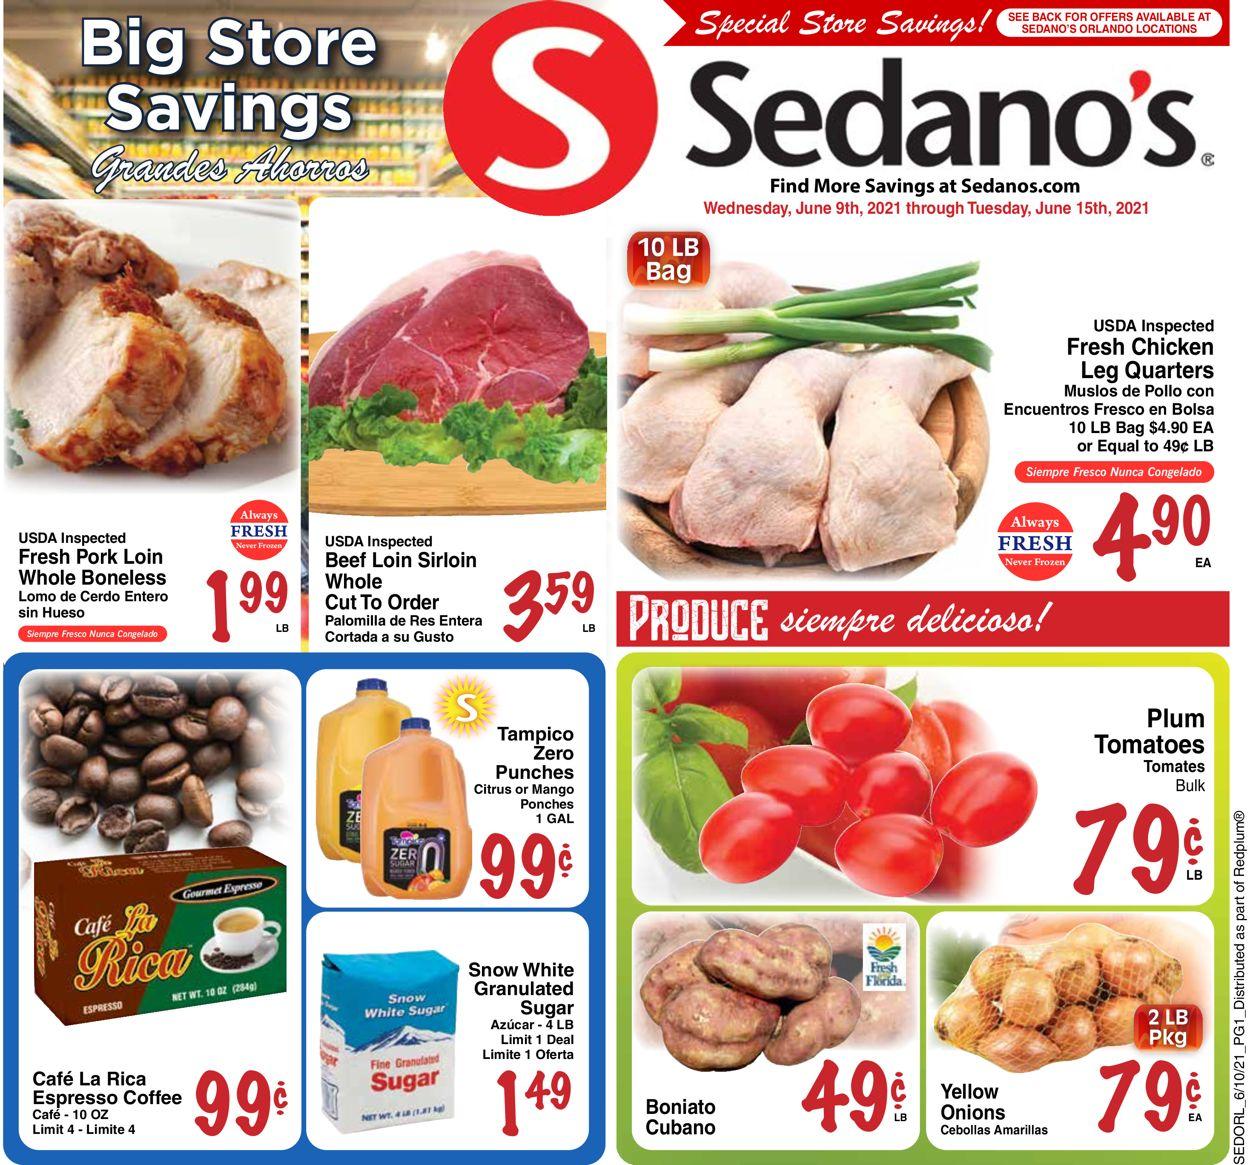 Sedano's Weekly Ad Circular - valid 06/09-06/15/2021